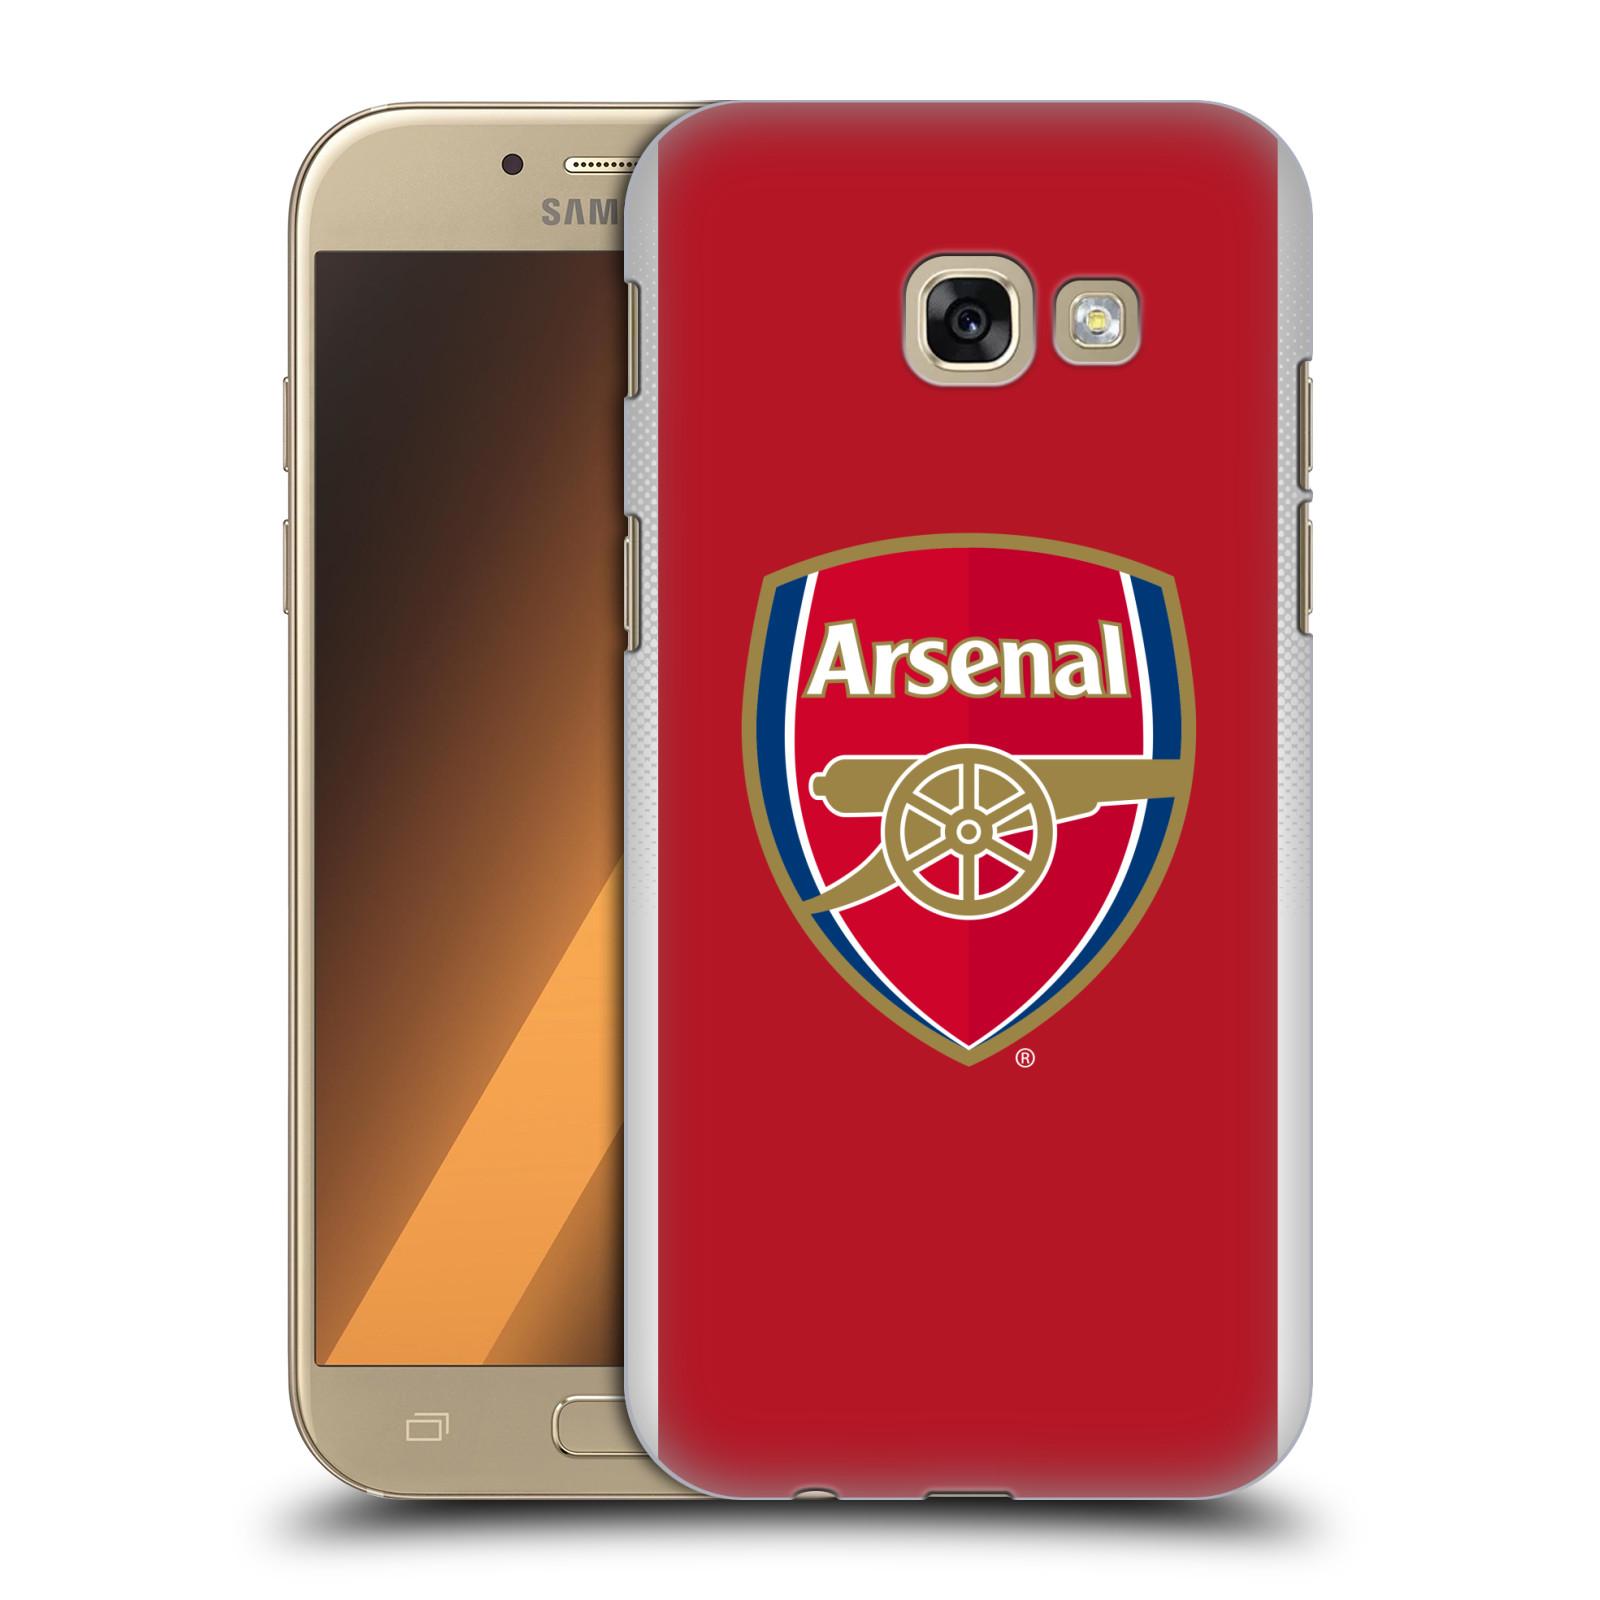 Plastové pouzdro na mobil Samsung Galaxy A5 (2017) - Head Case - Arsenal FC - Logo klubu